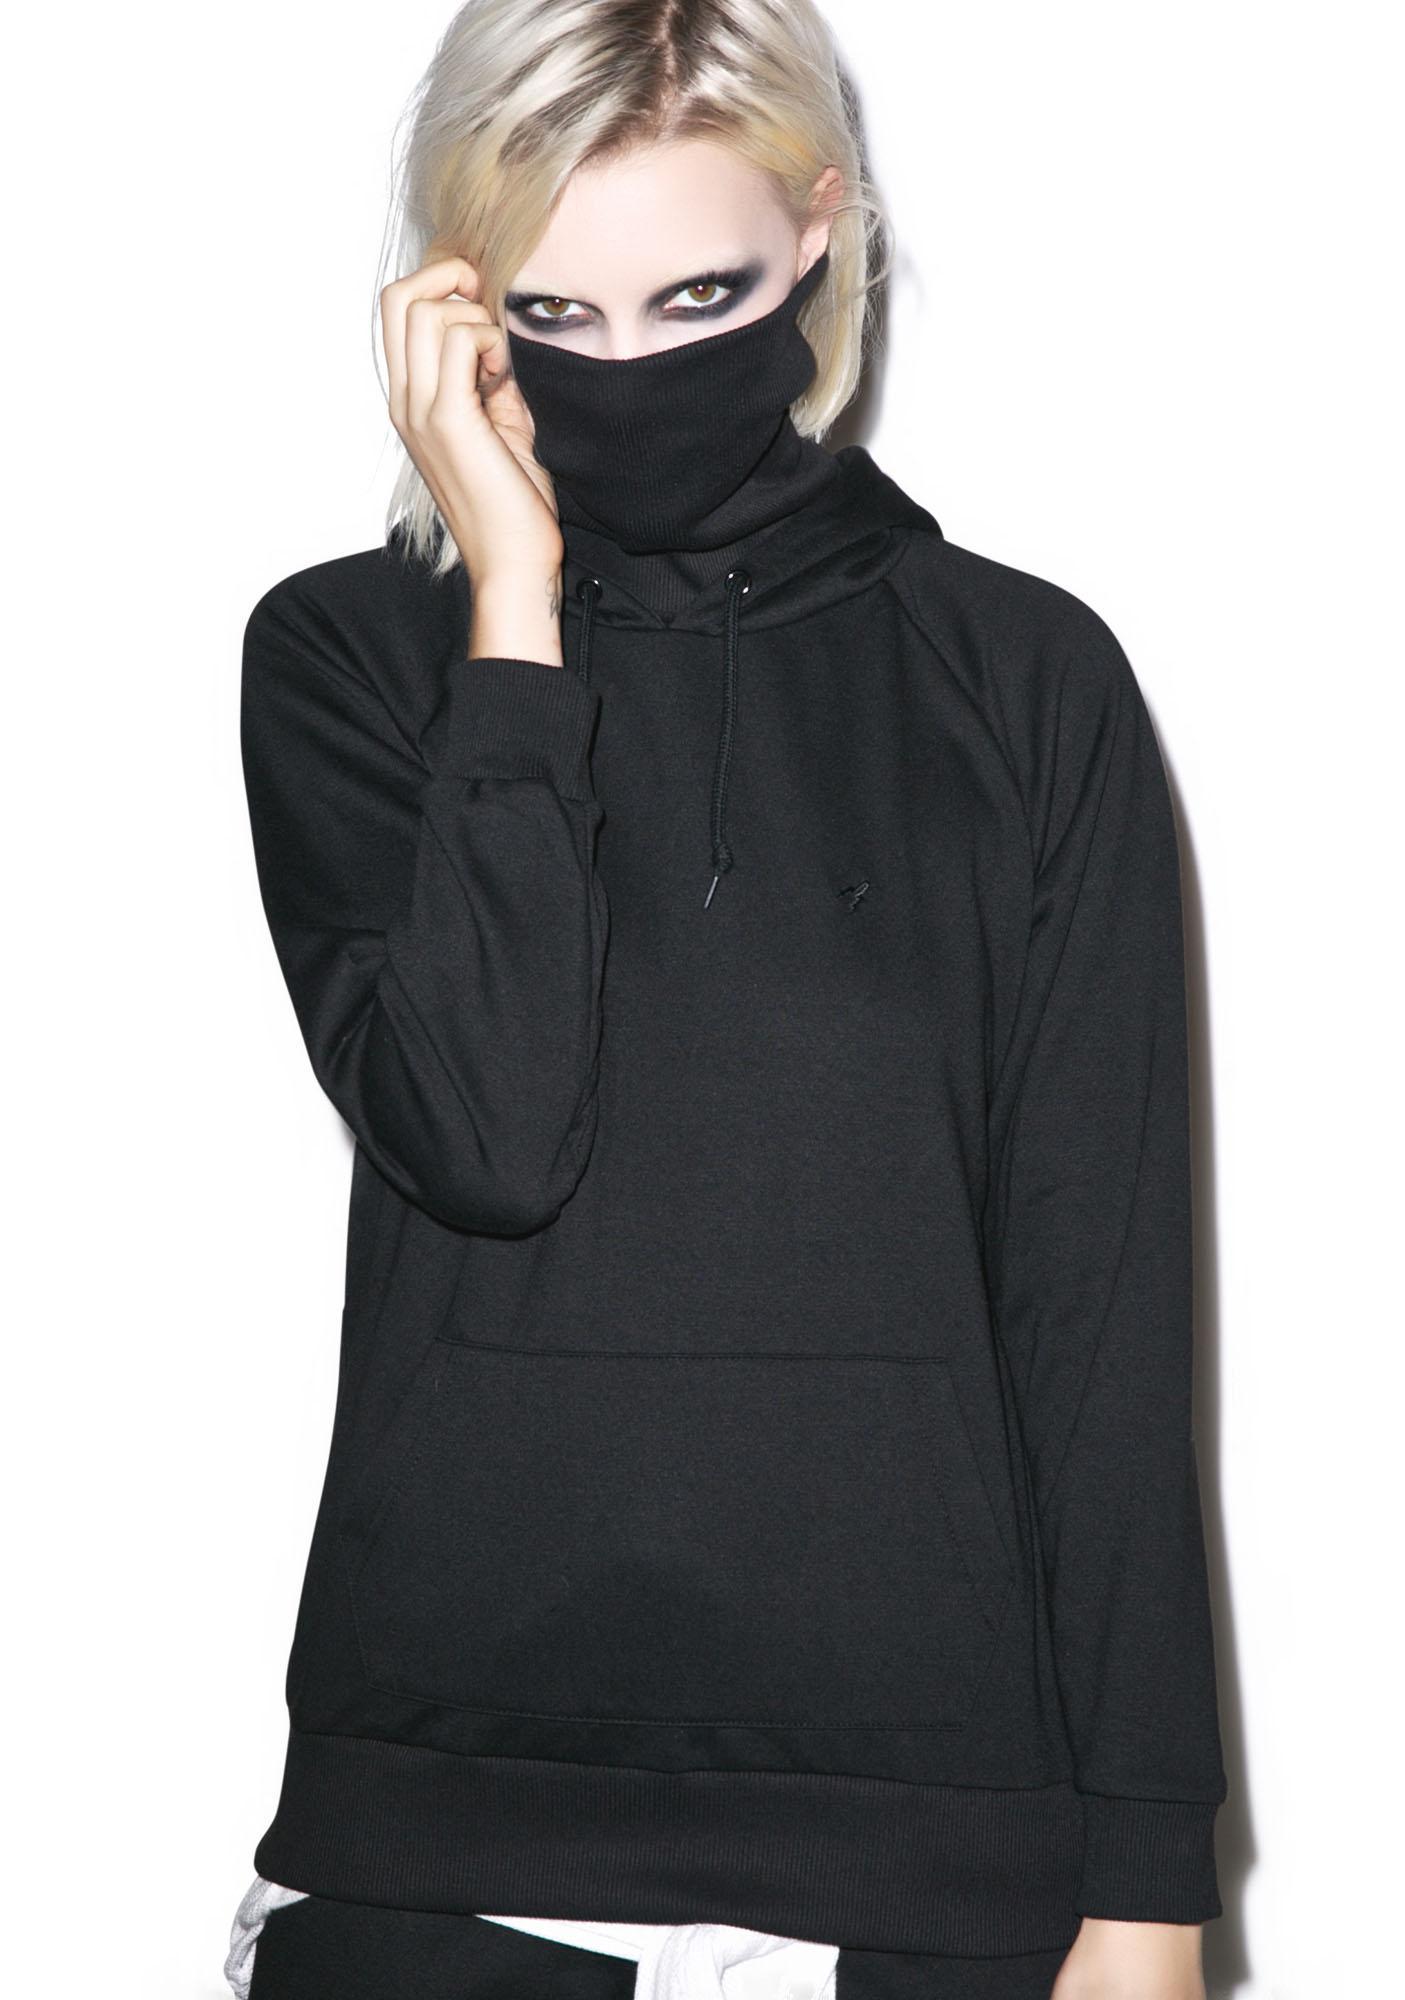 Kato Ninja Hoodie